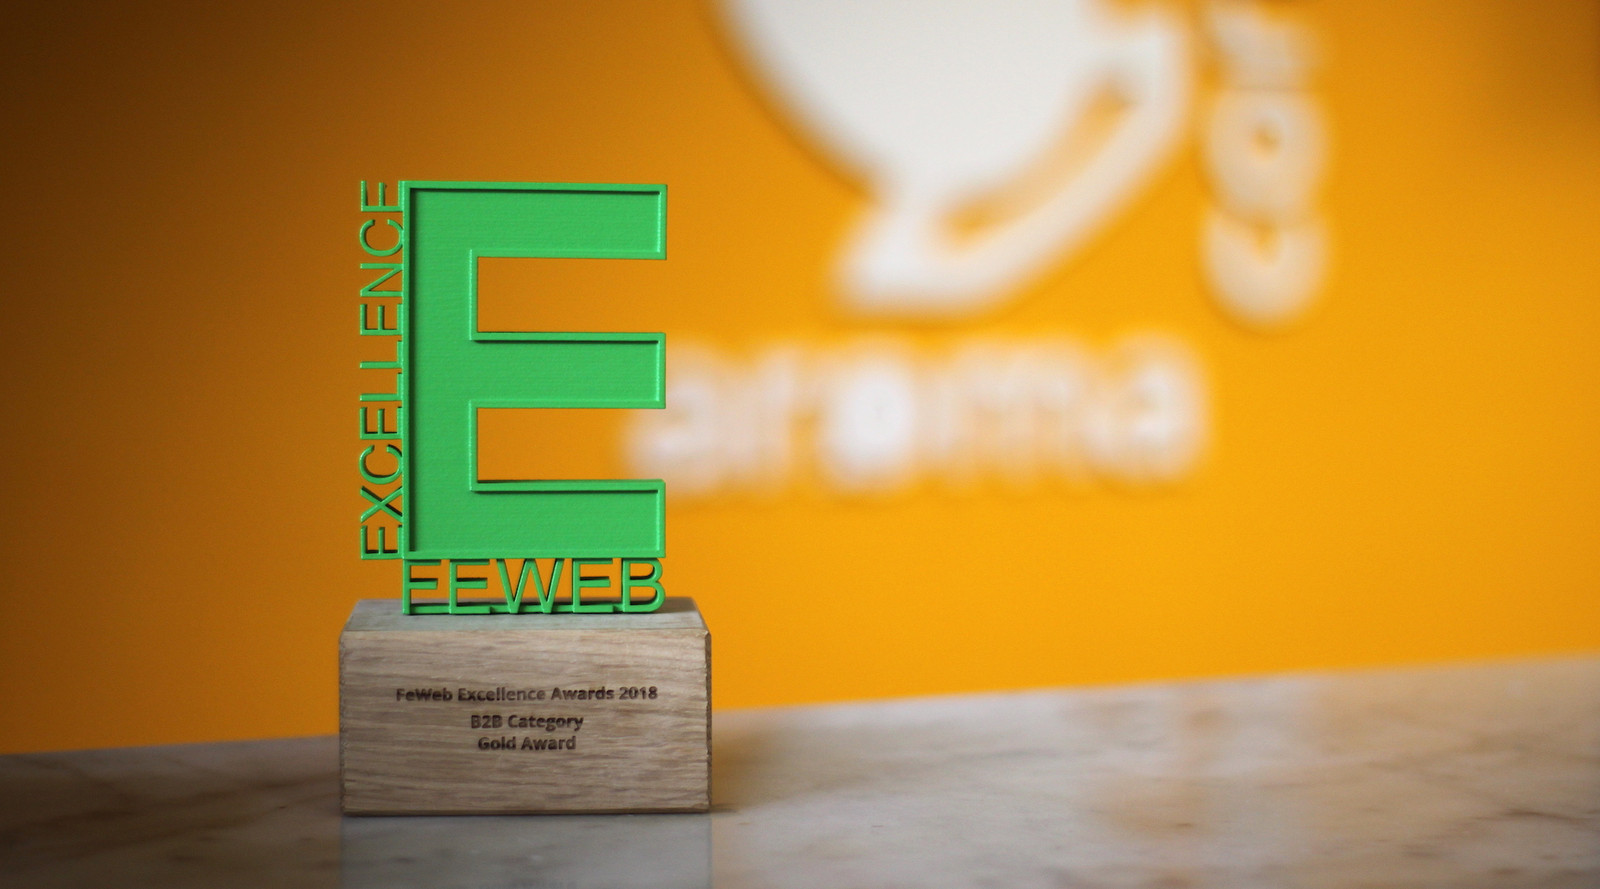 De award die Aroma Communicatie in ontvangst mocht nemen.